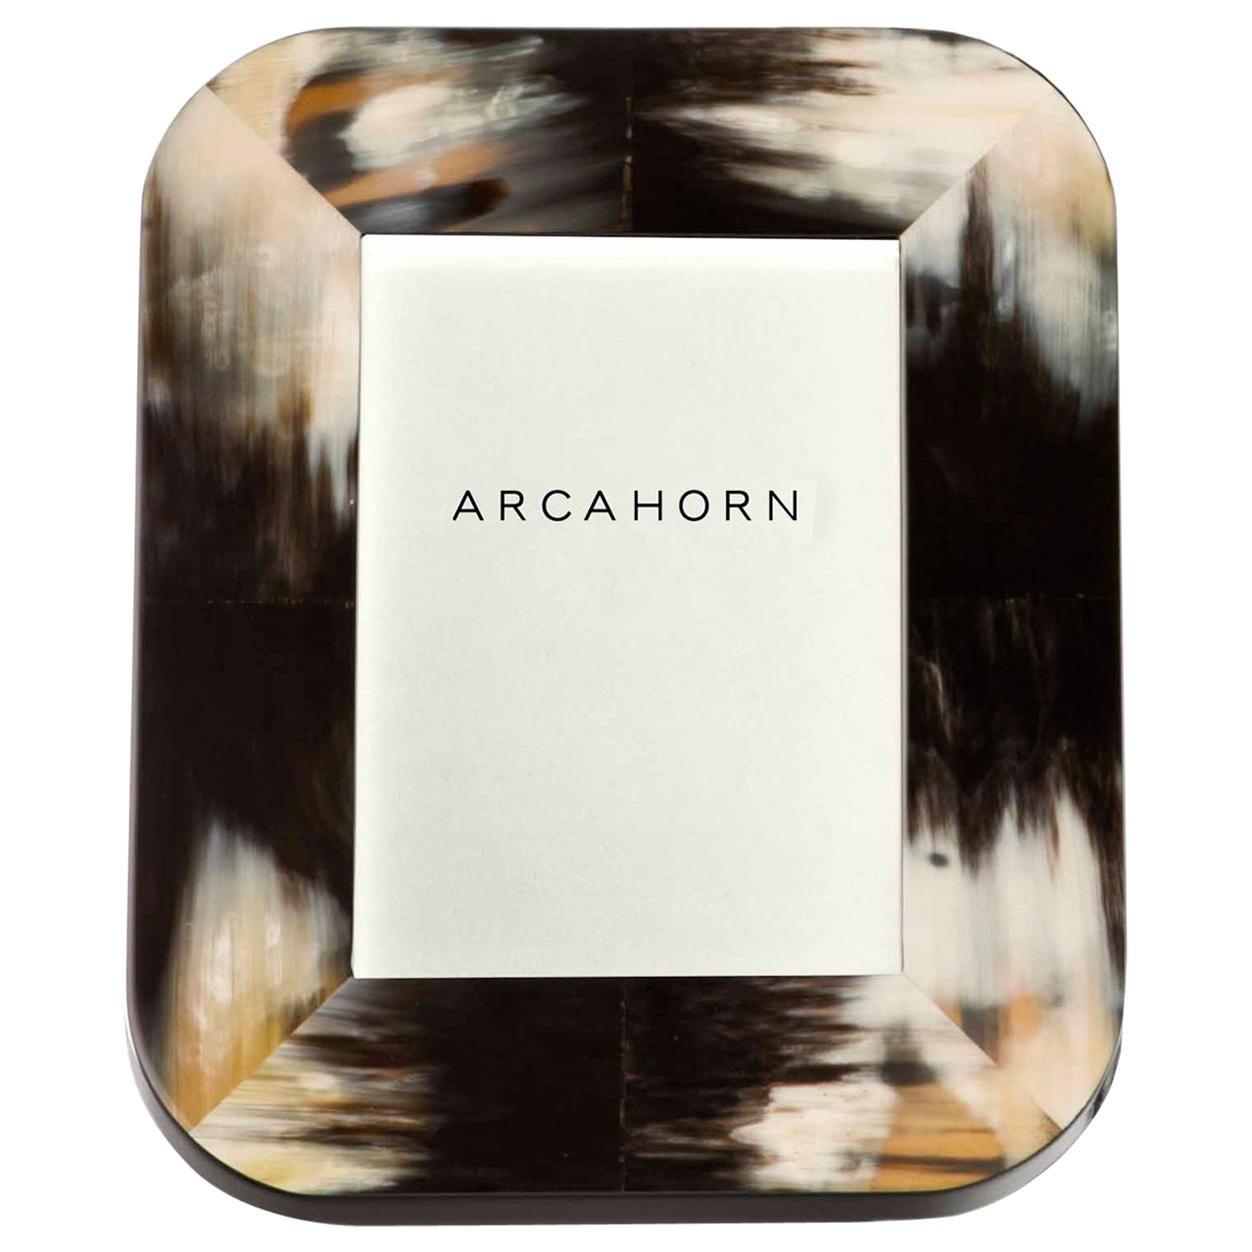 Picture Frame in Dark Corno Italiano and Glossy Black Lacquered Wood, Mod. 4010